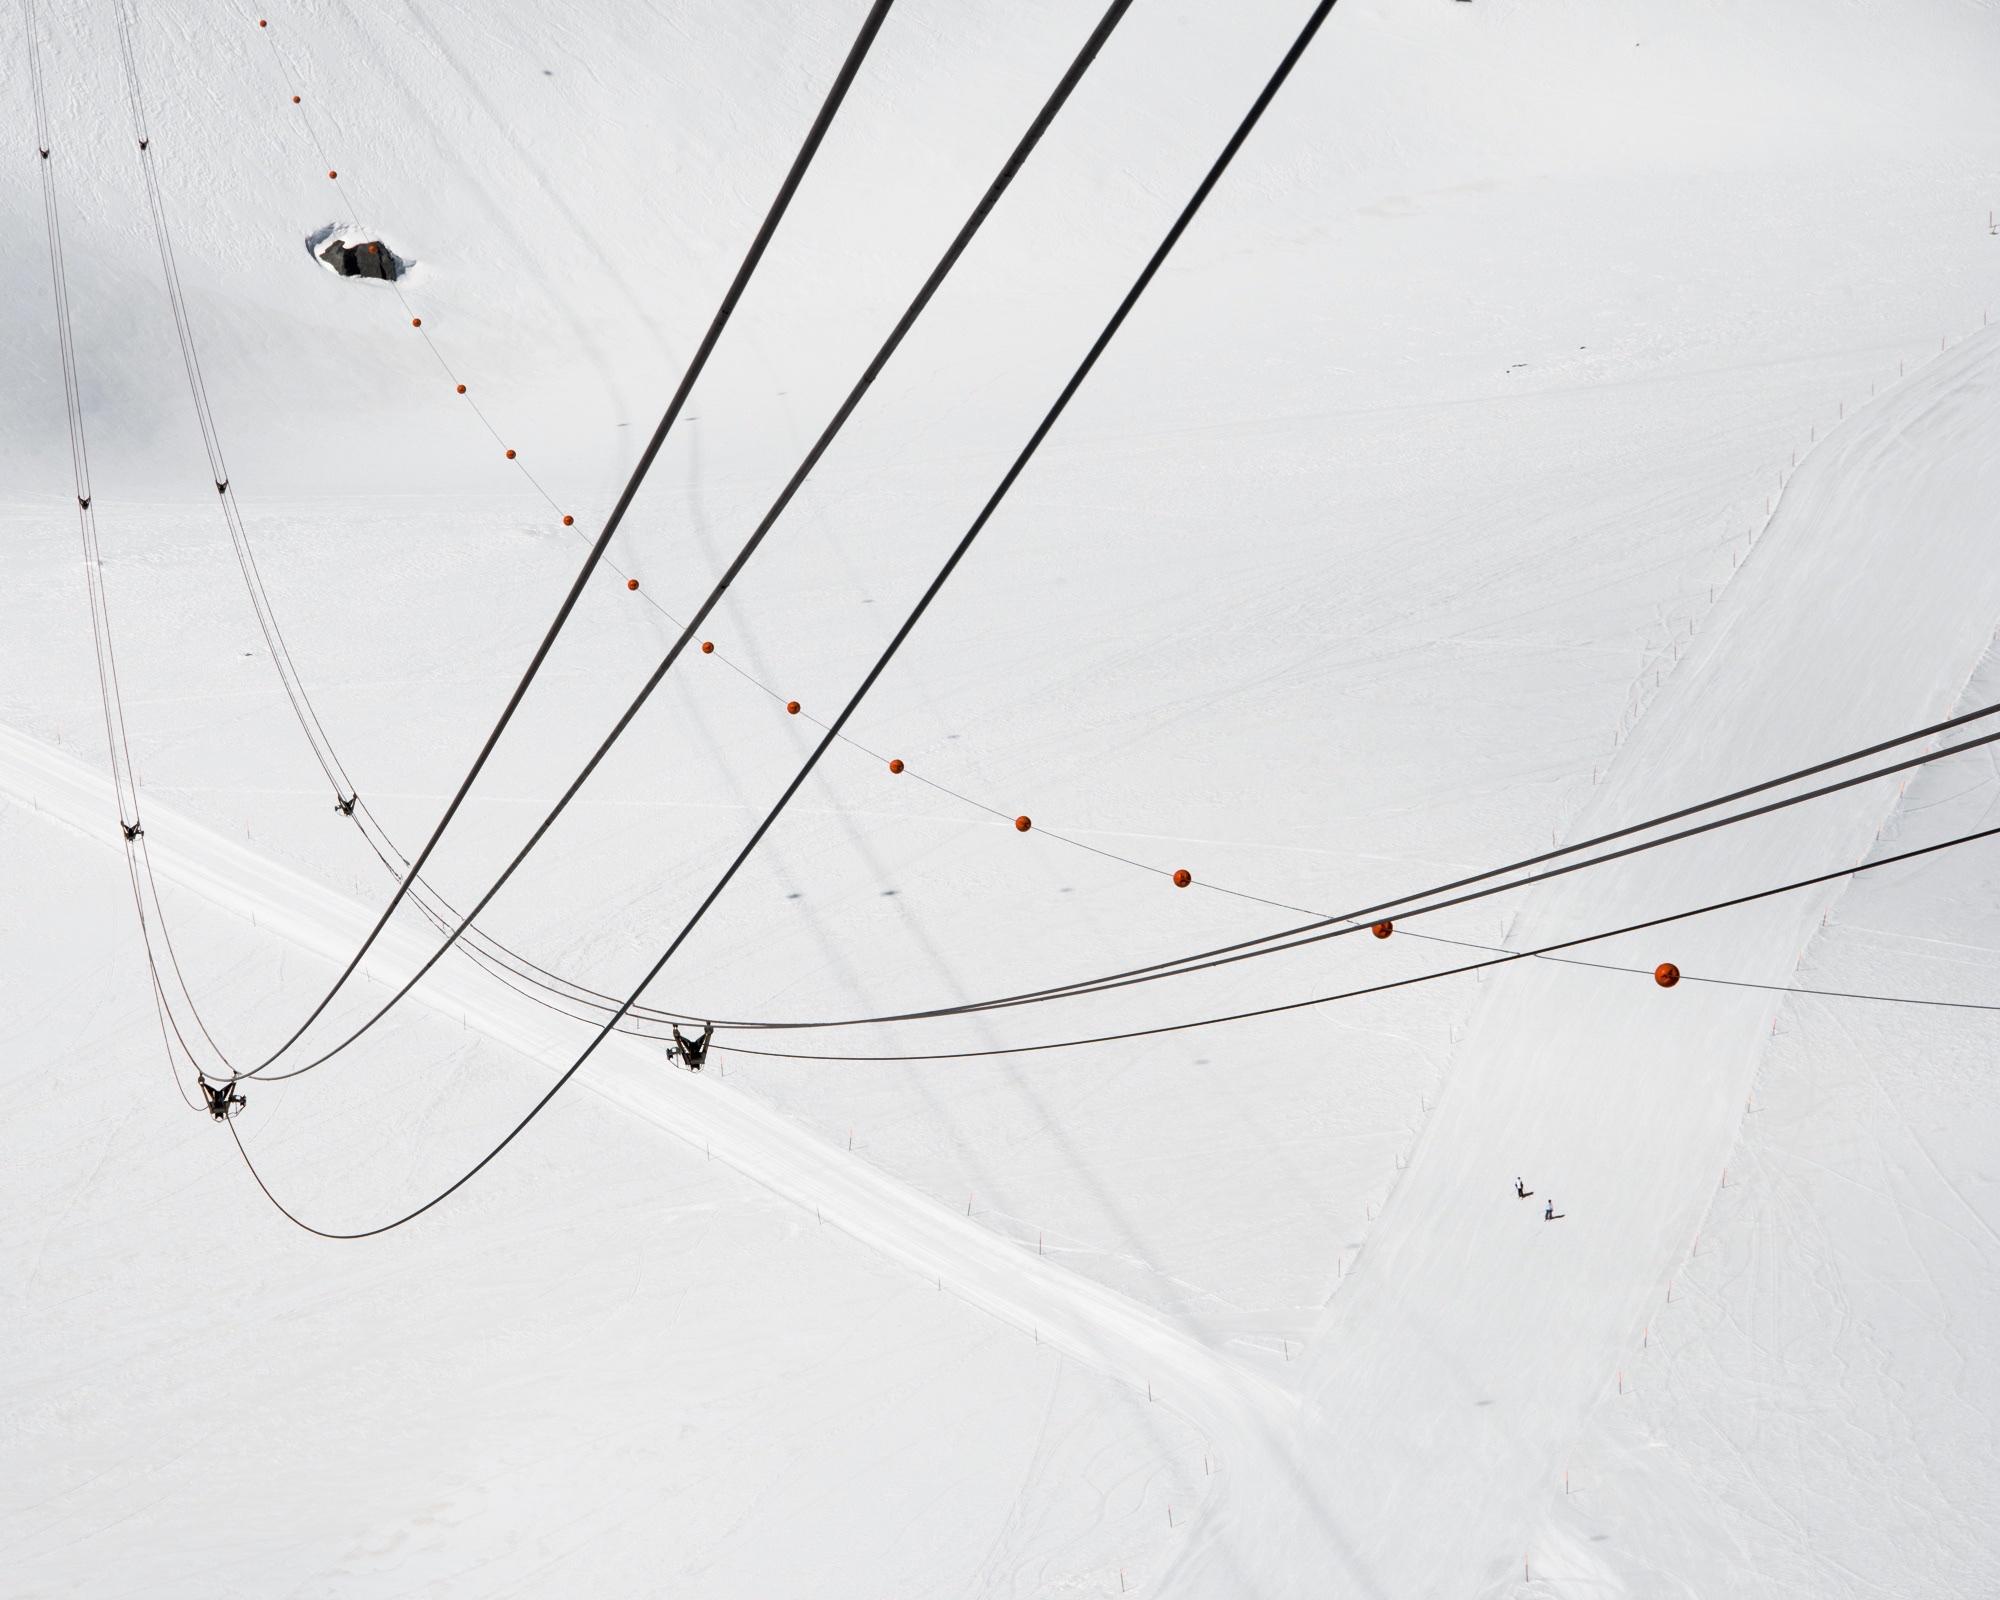 Cables, Verbier 2014